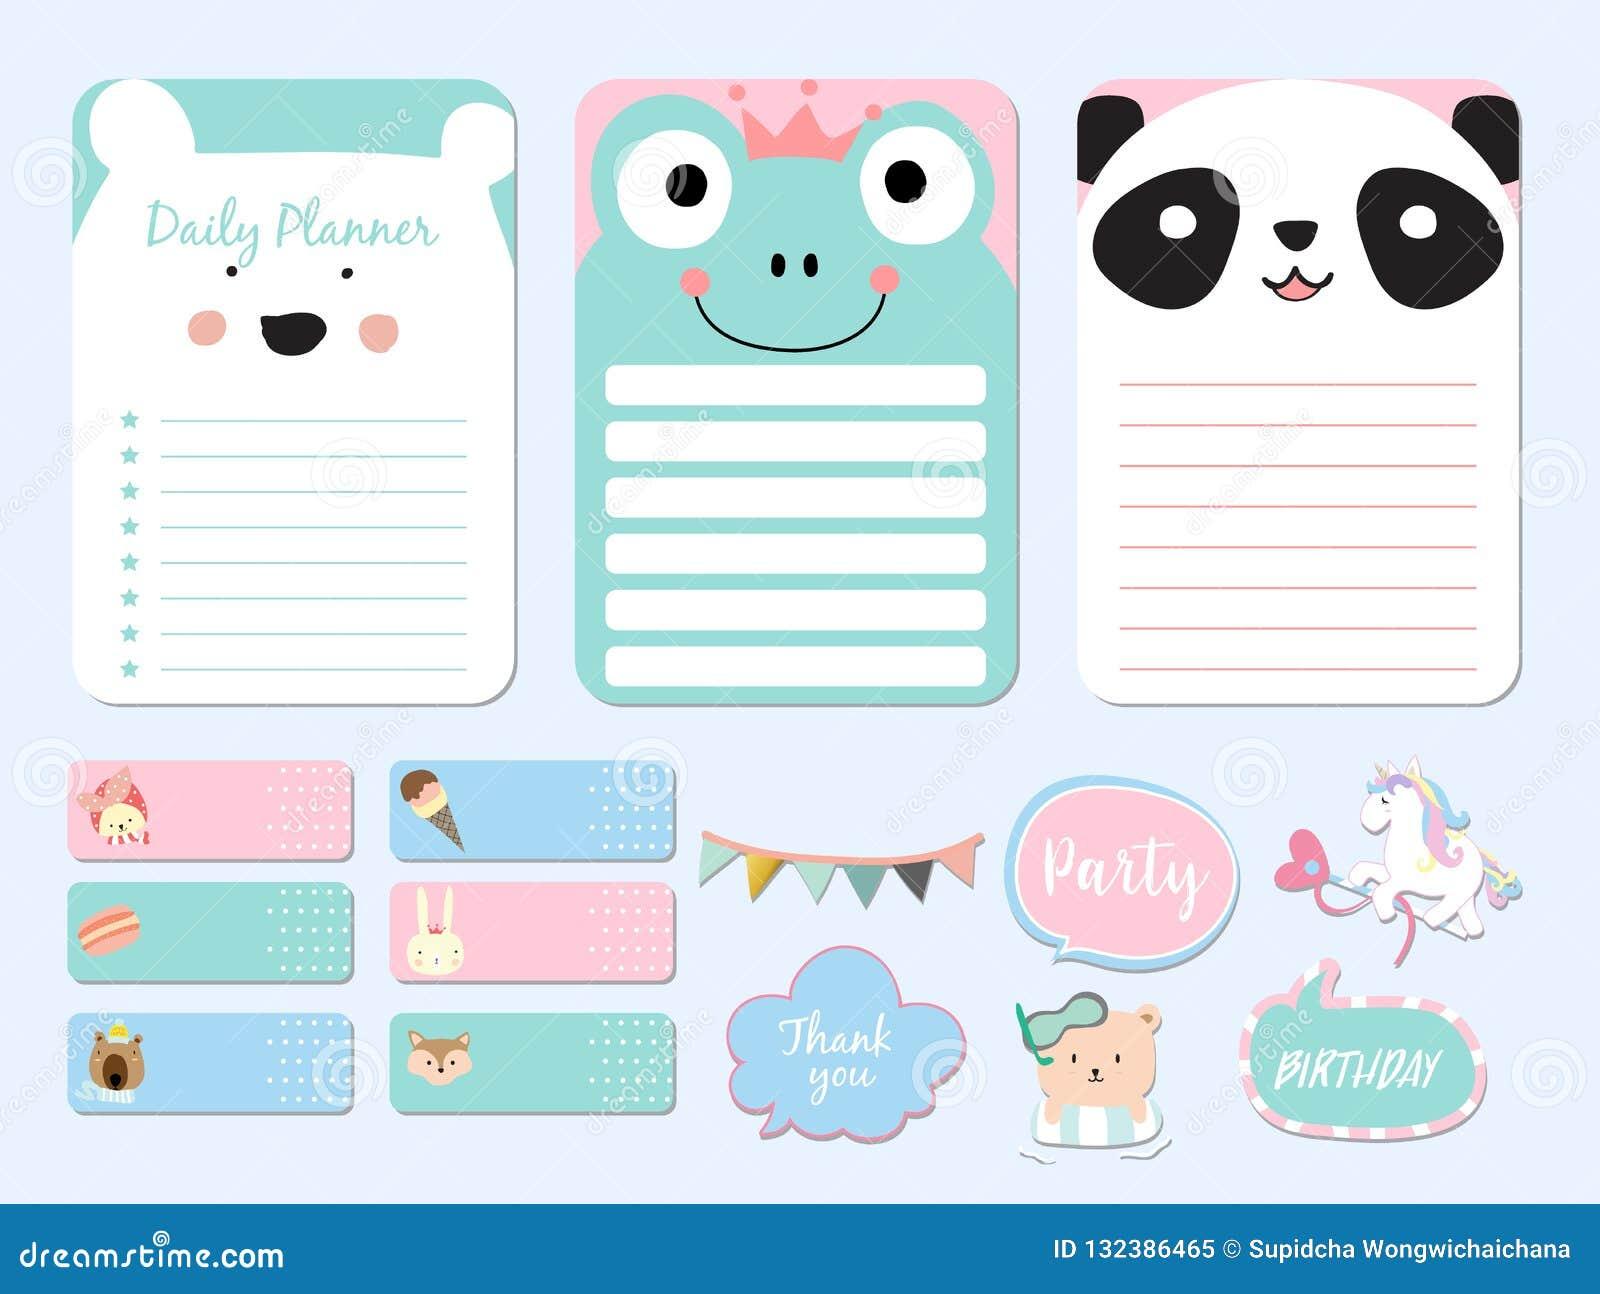 Pastel Printable With Bear, Panda, Fox, Unicorn, Ice Cream In Funny